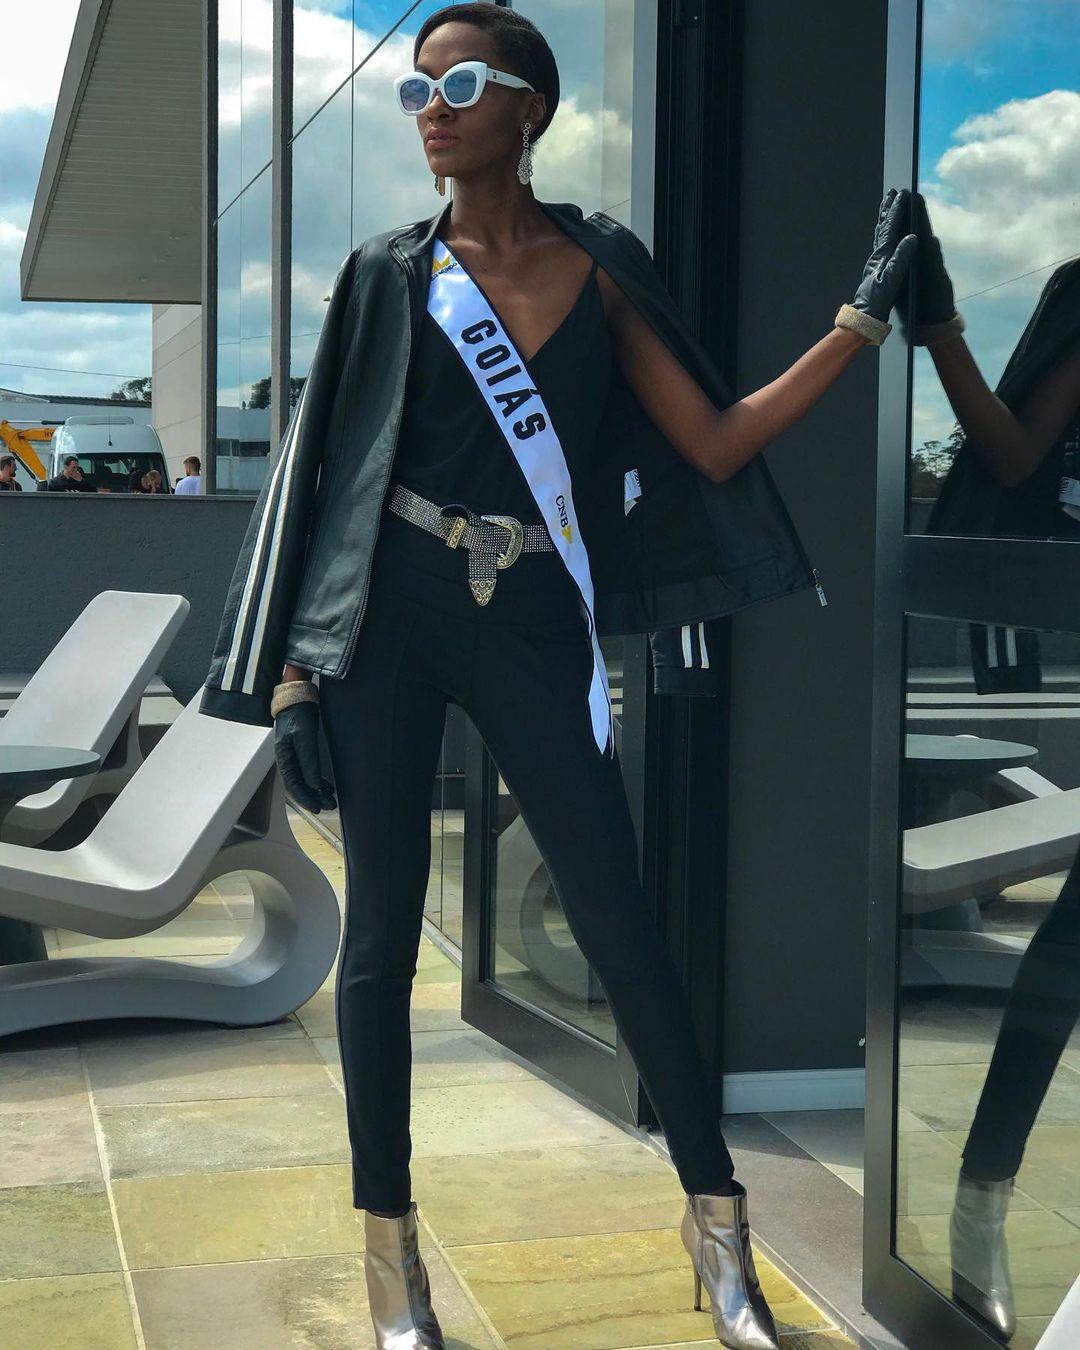 fernanda bispo, top 20 de miss brasil mundo 2019. - Página 7 F02nex10